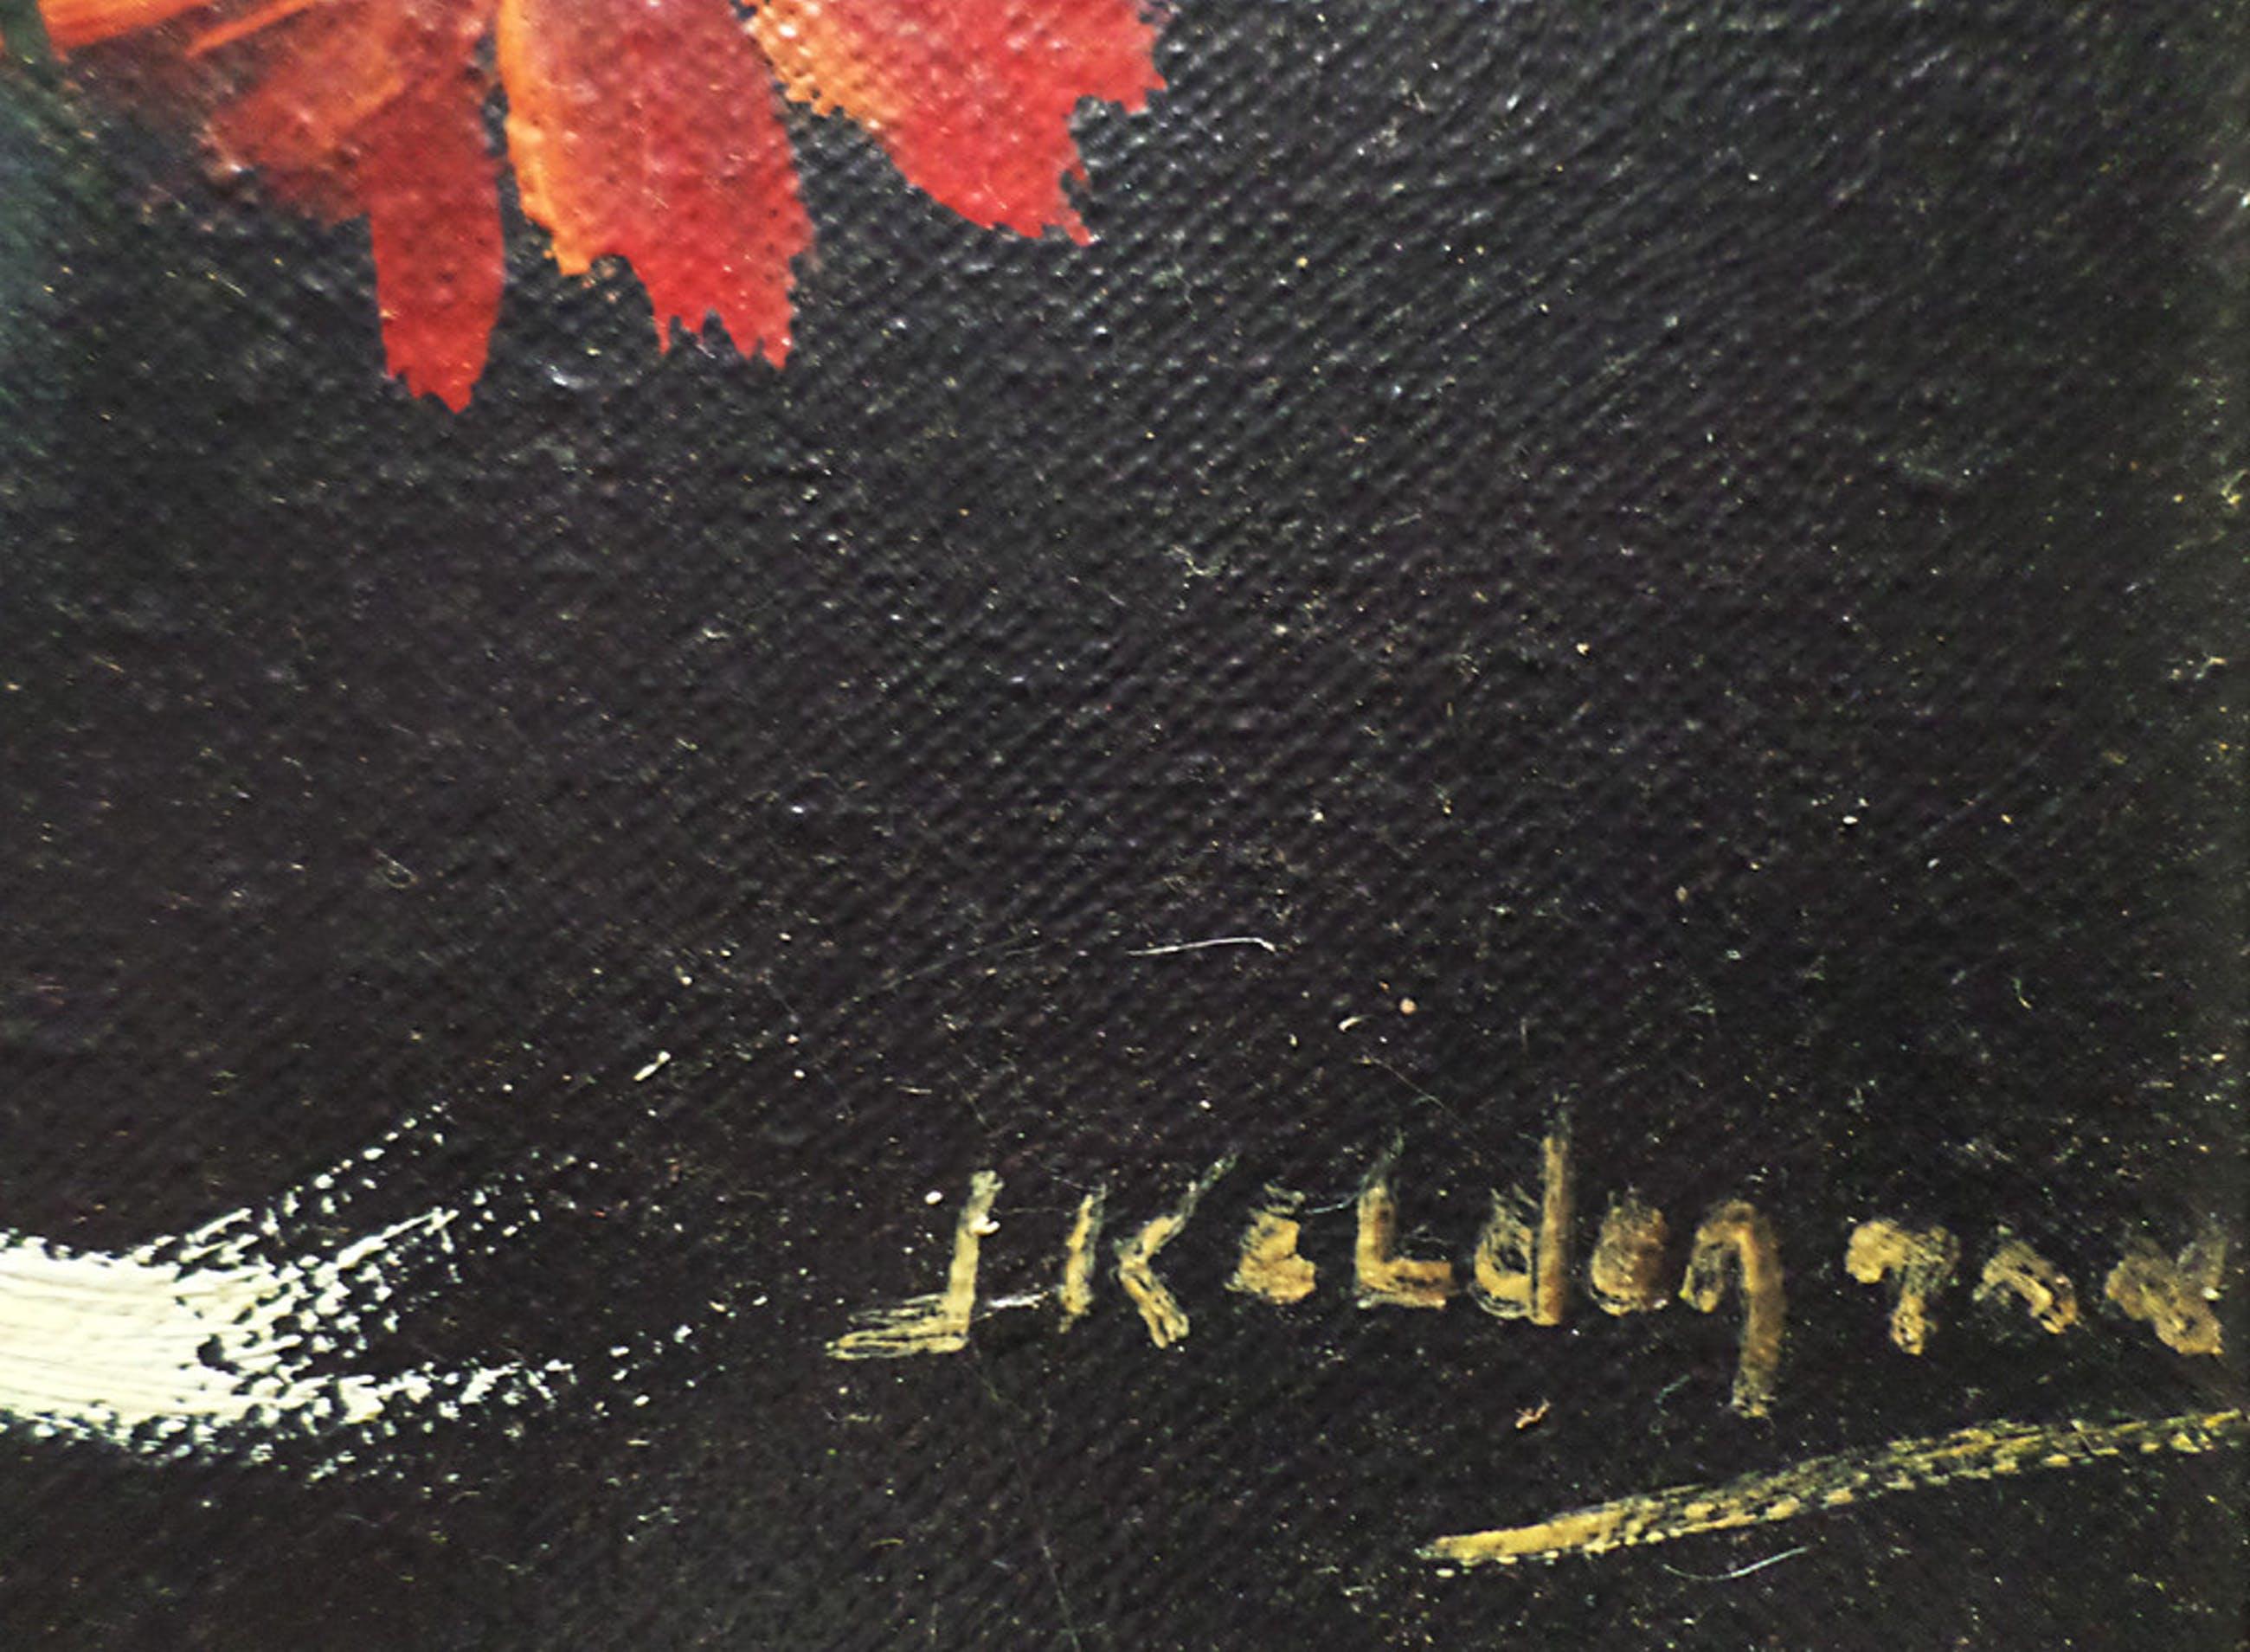 Jan Kelderman - Kleurensymphonie, olieverf op doek (ingelijst) kopen? Bied vanaf 1!